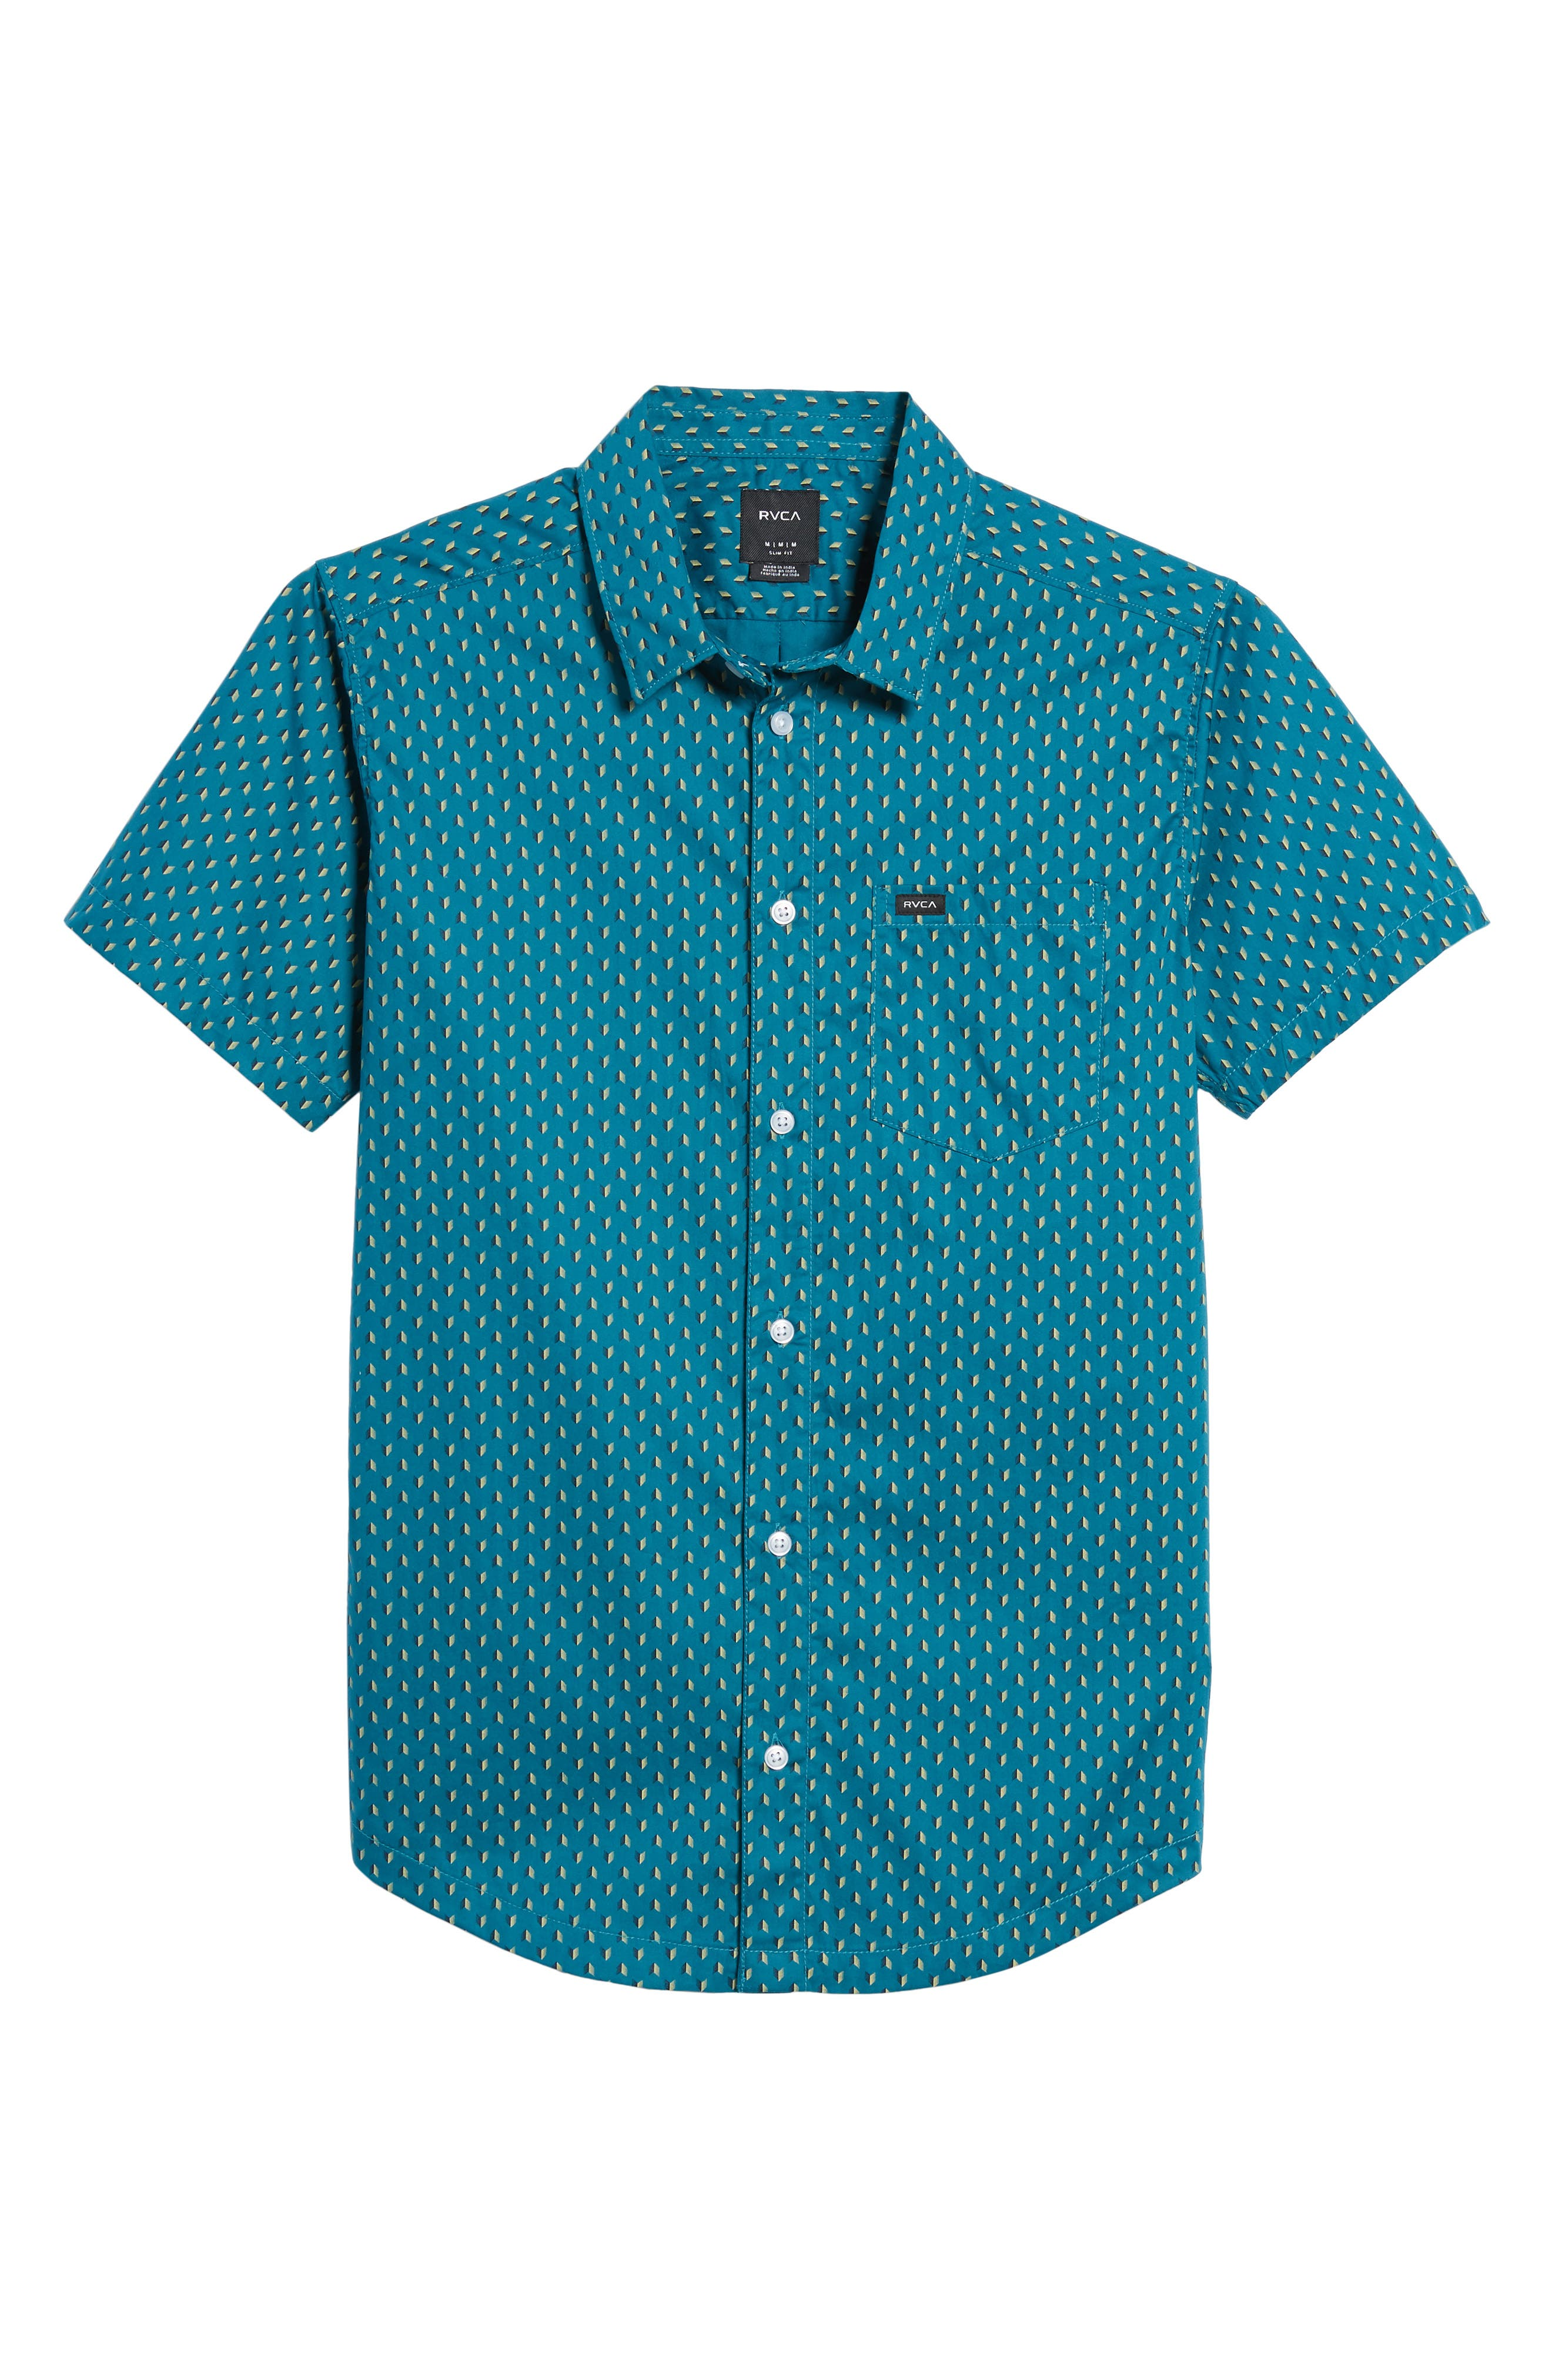 Arrowed Woven Shirt,                             Alternate thumbnail 6, color,                             408